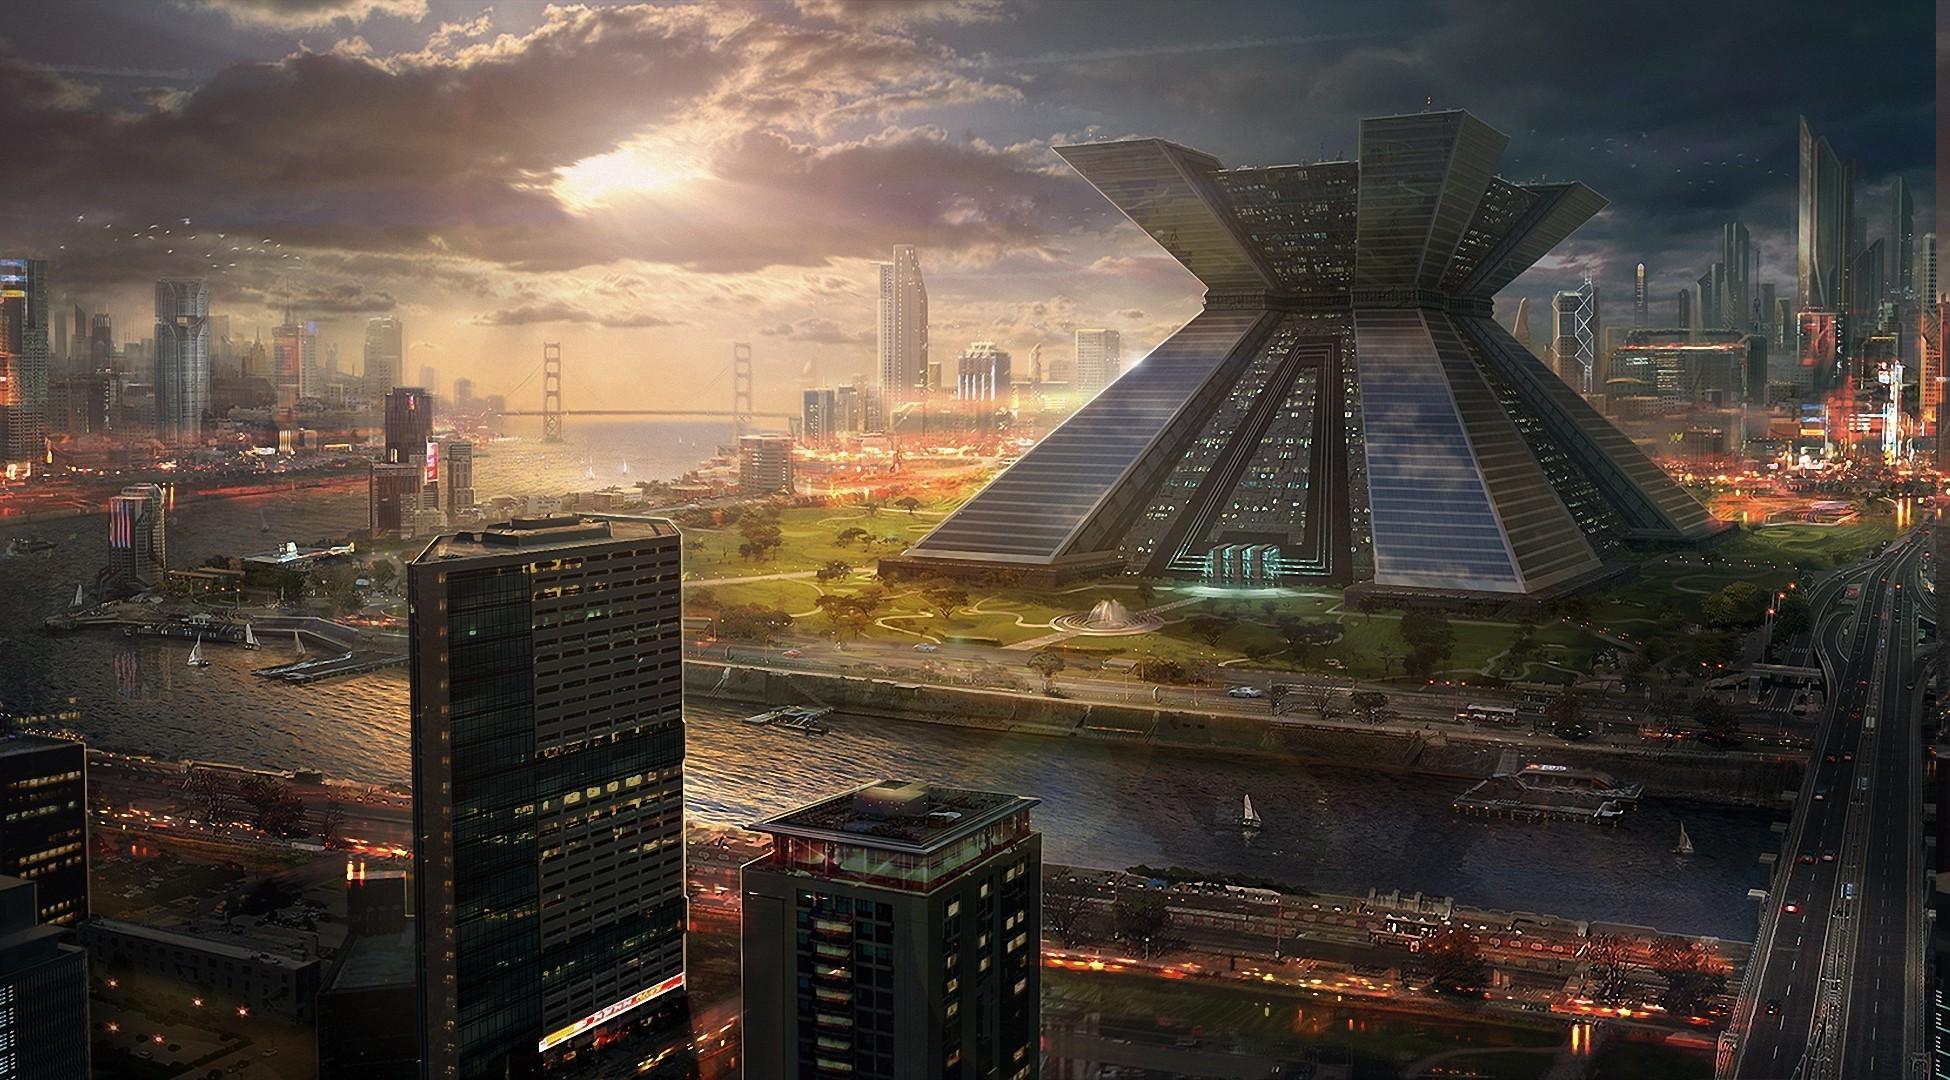 Fantasy Landscape Cities Cityscapes